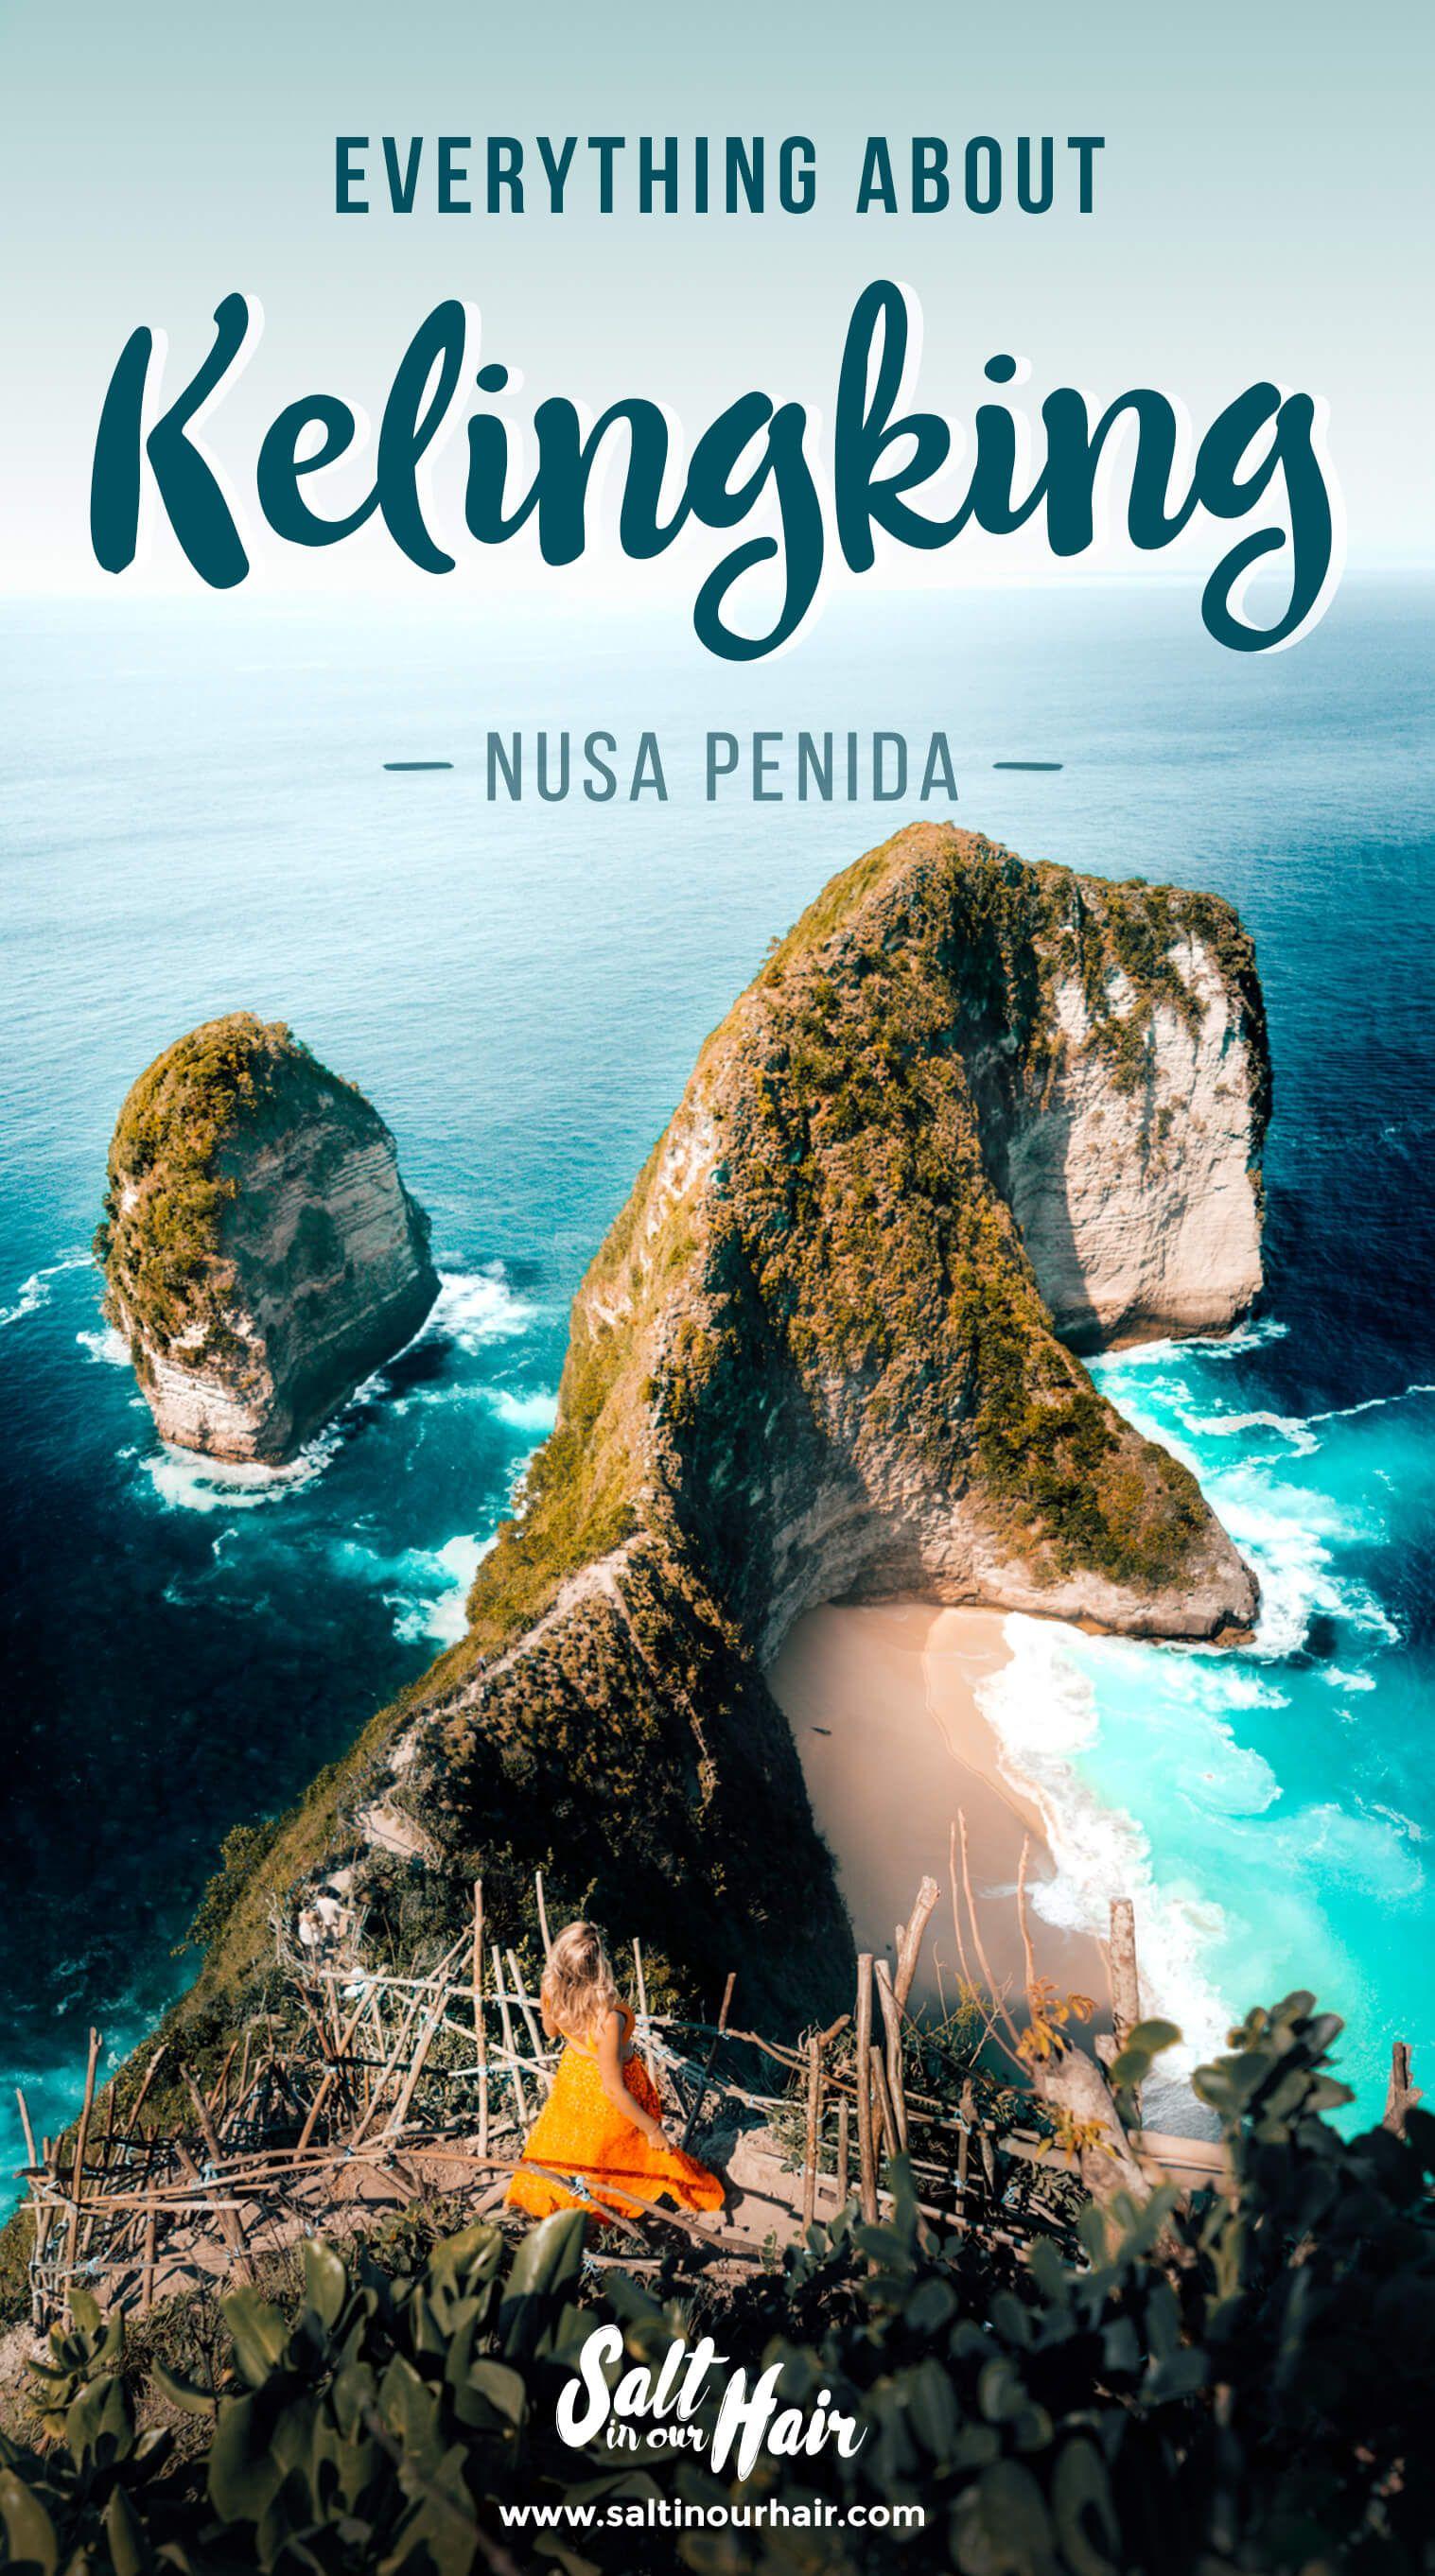 Kelingking on Nusa Penida – Everything you need to know  #kelingking #nusapenida  Kelingking Beach | Nusa Penida | Bali | Bali Beach | viewpoint